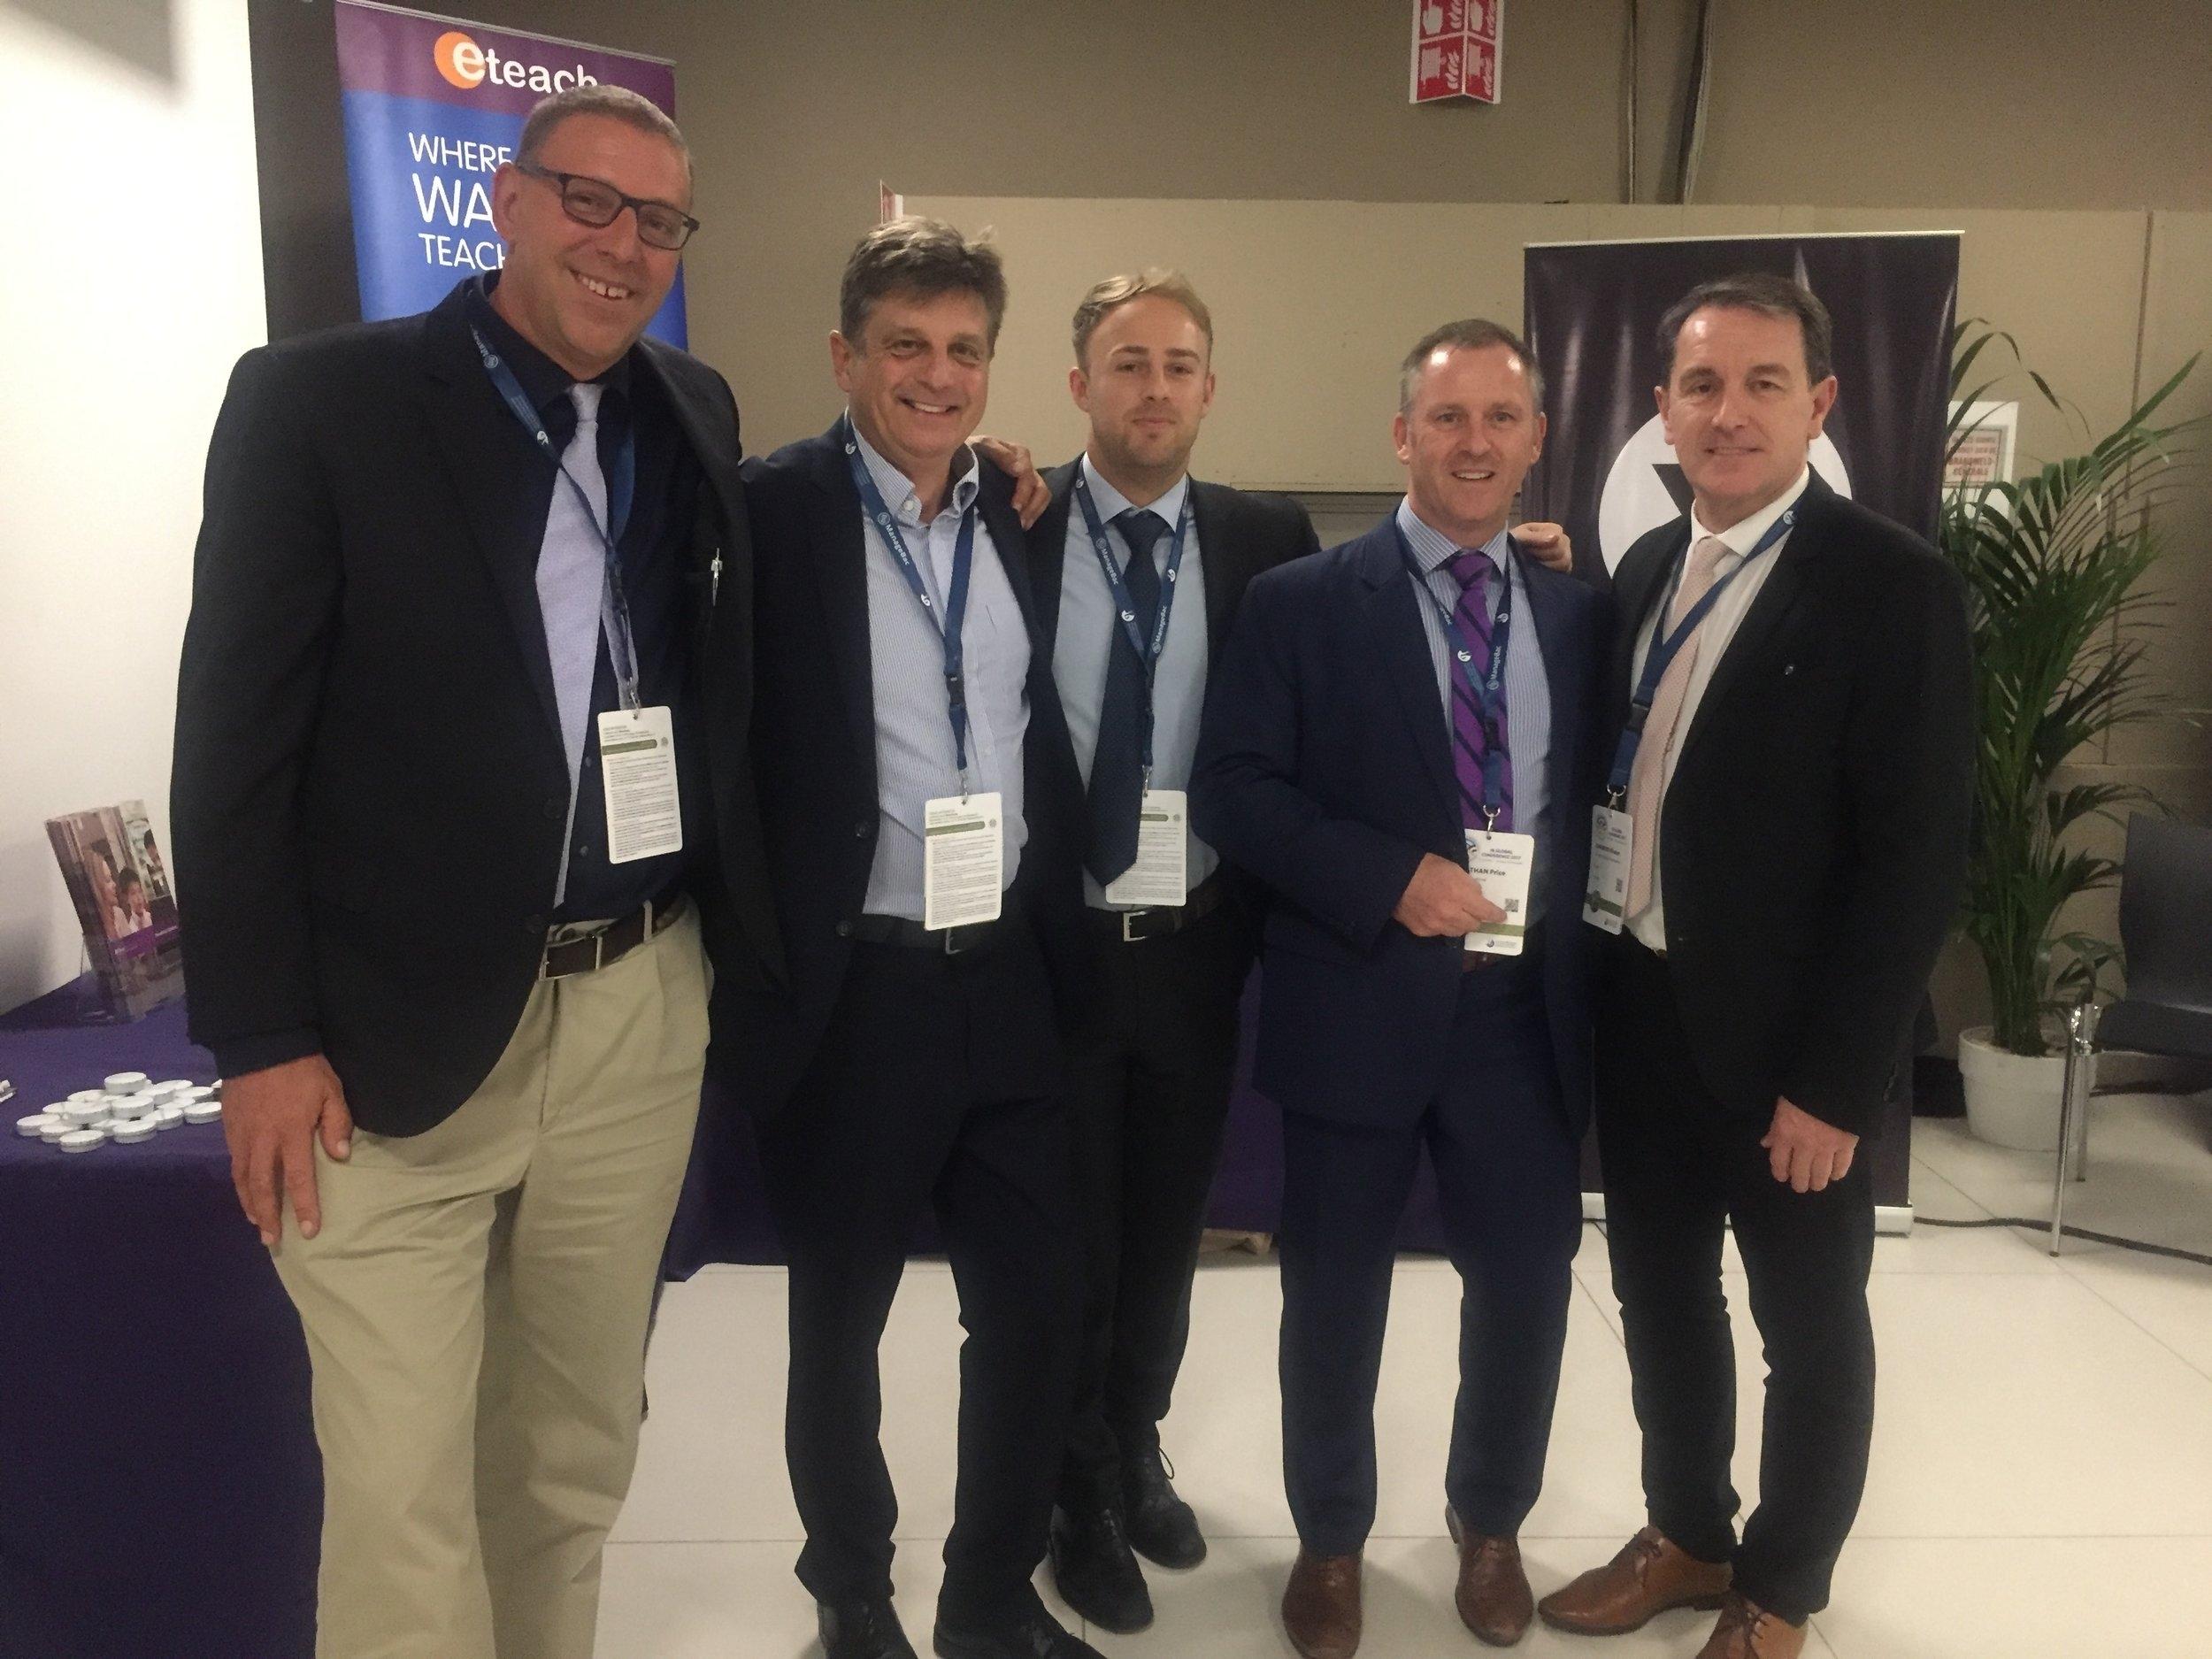 Netherlands. - COBIS World IB Conference, 2018.